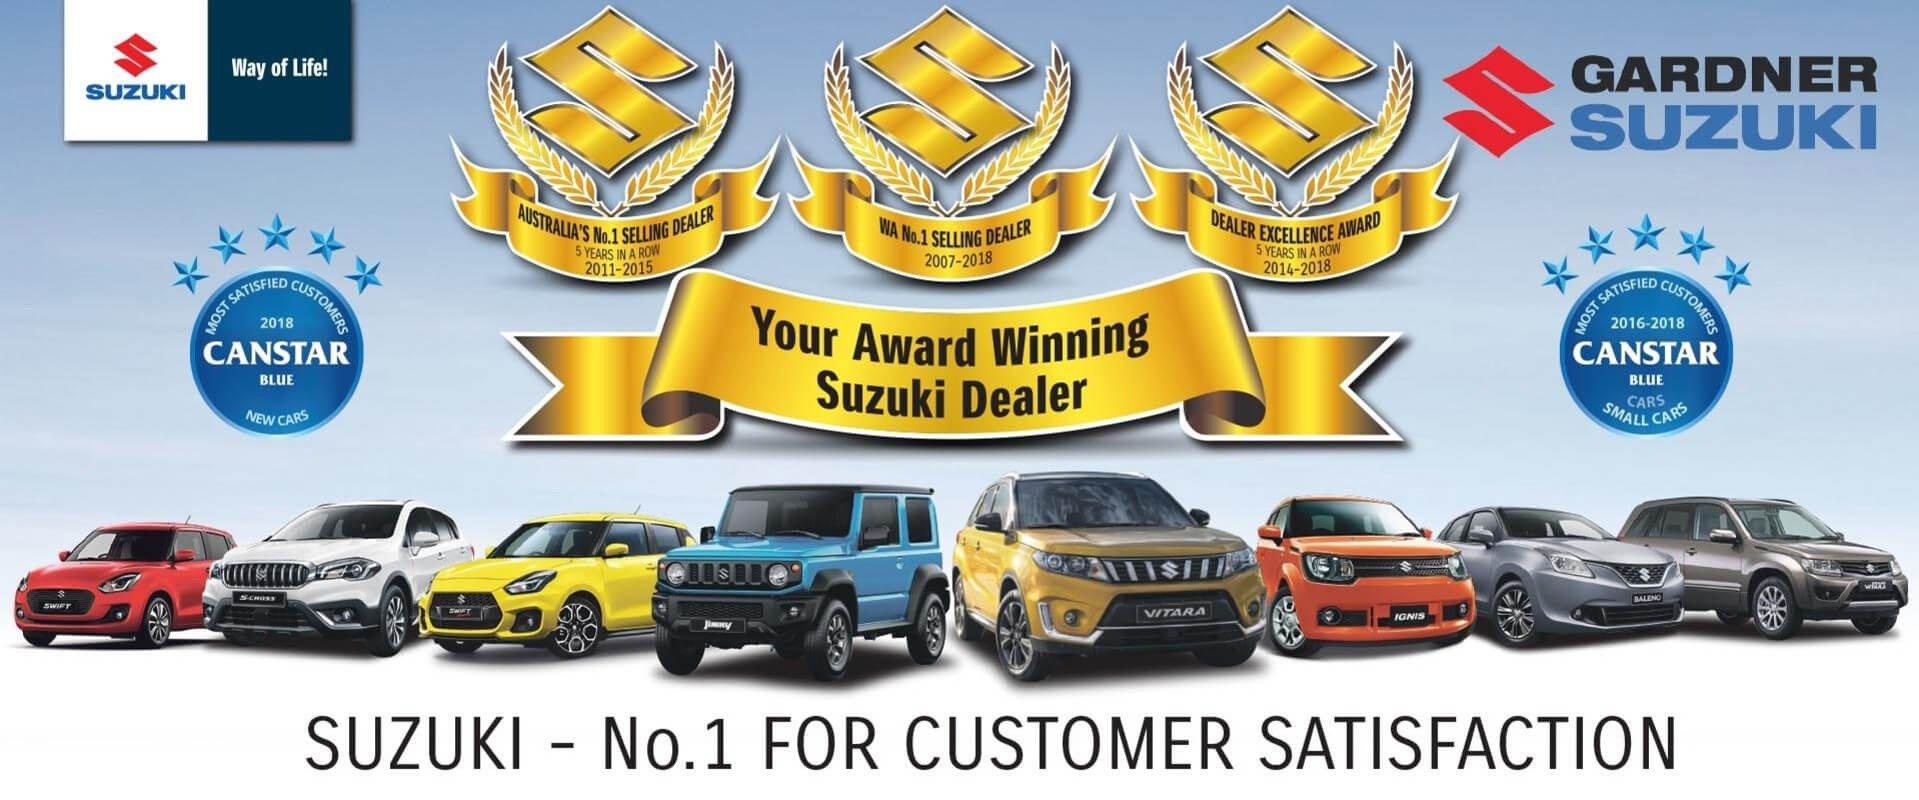 Gardner Suzuki - Award Winning